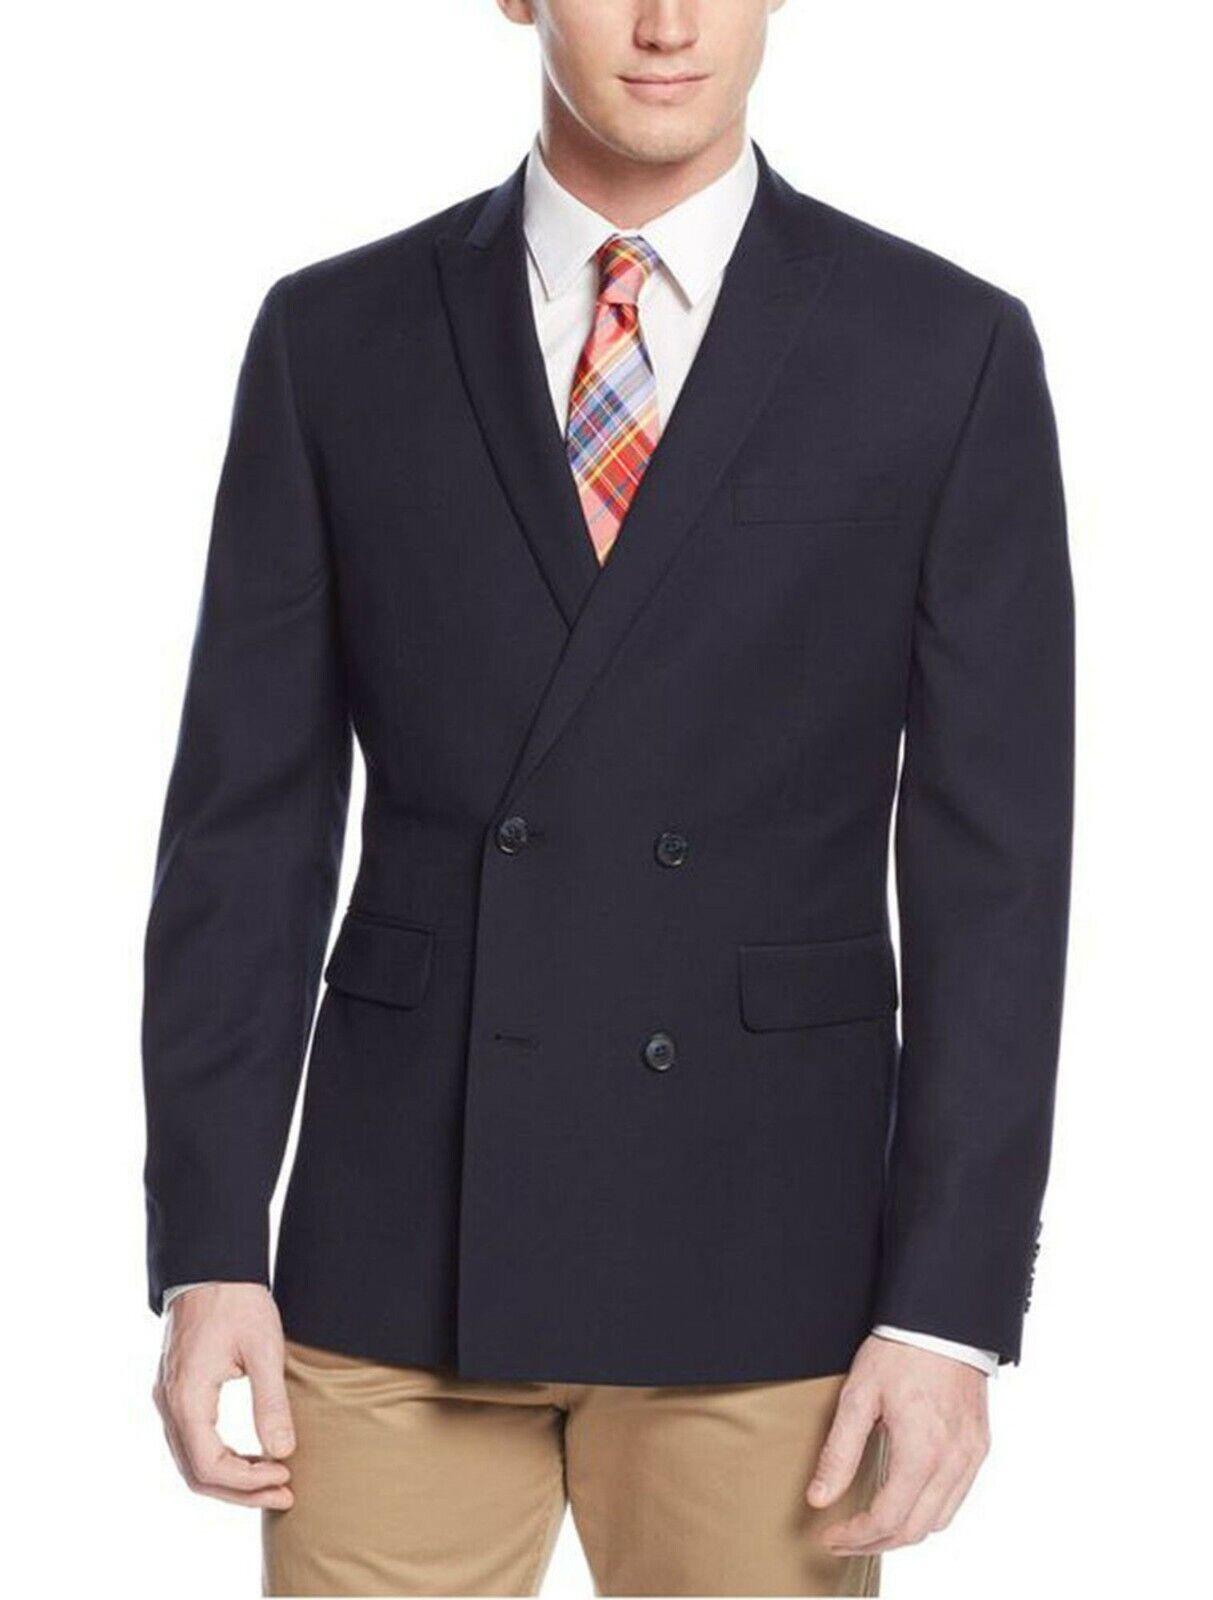 Bar III Slim Fit Navy Blau Double Breasted Sportcoat Blazer w  Peak Lapels 36S